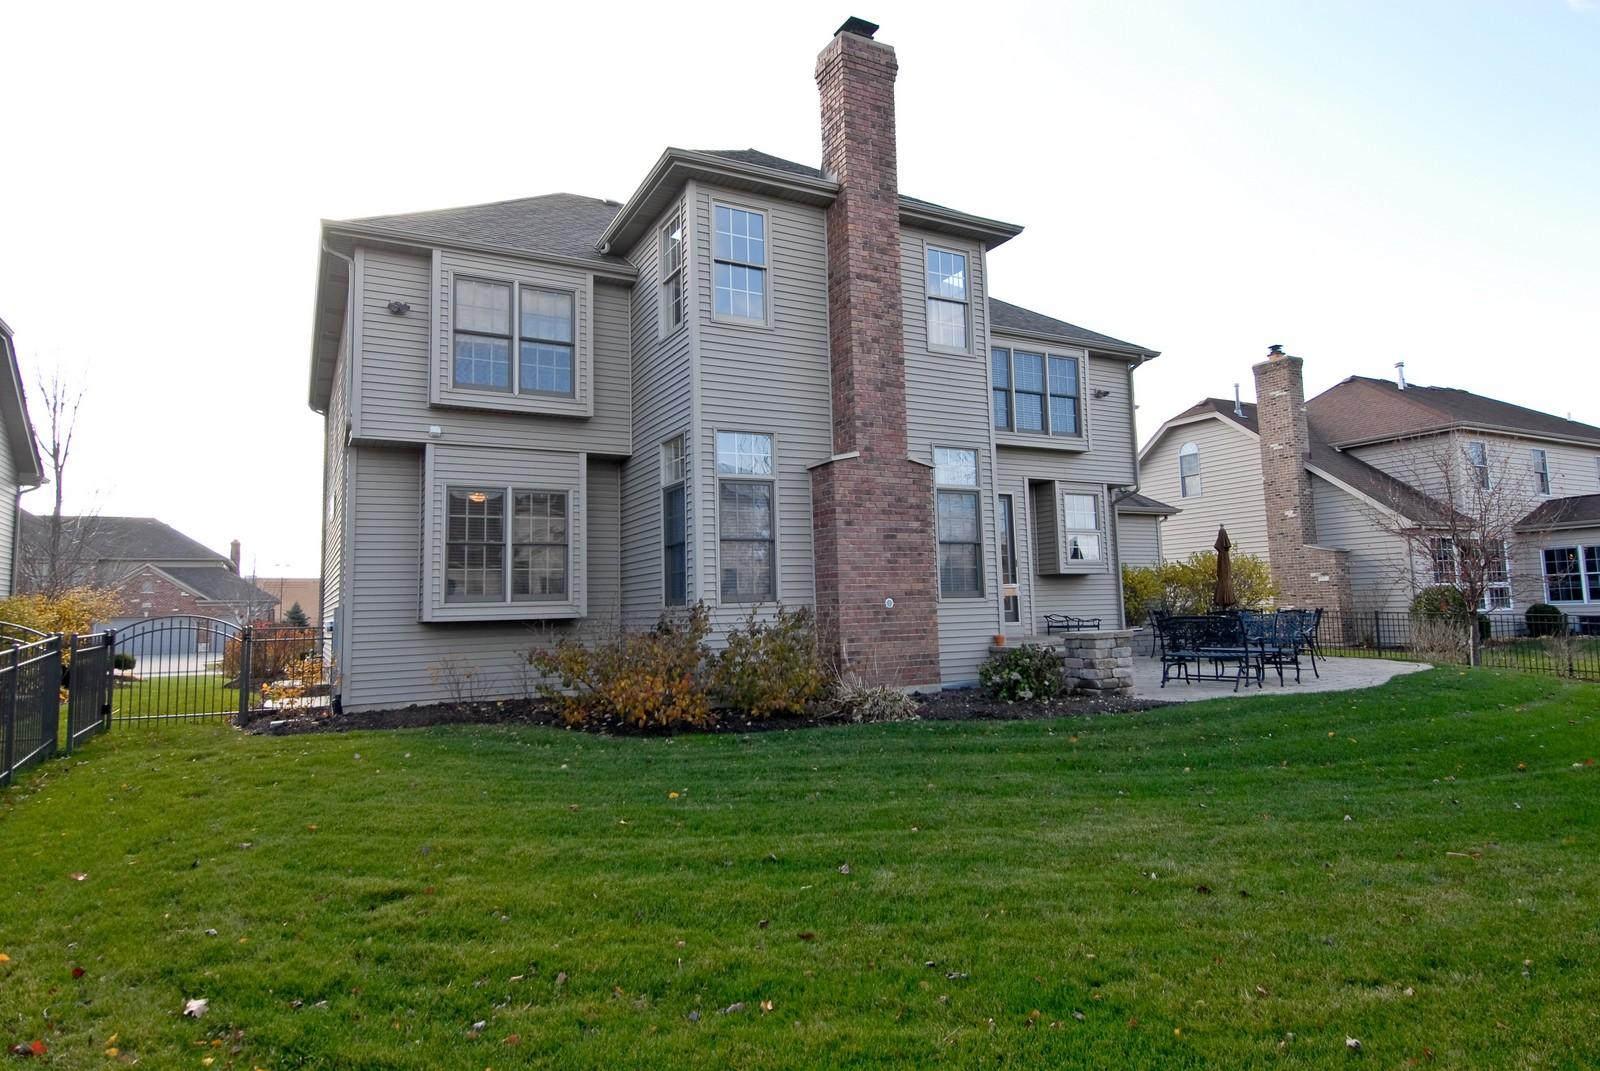 Real Estate Photography - 3839 Junebreeze Ln, Naperville, IL, 60564 - Rear View